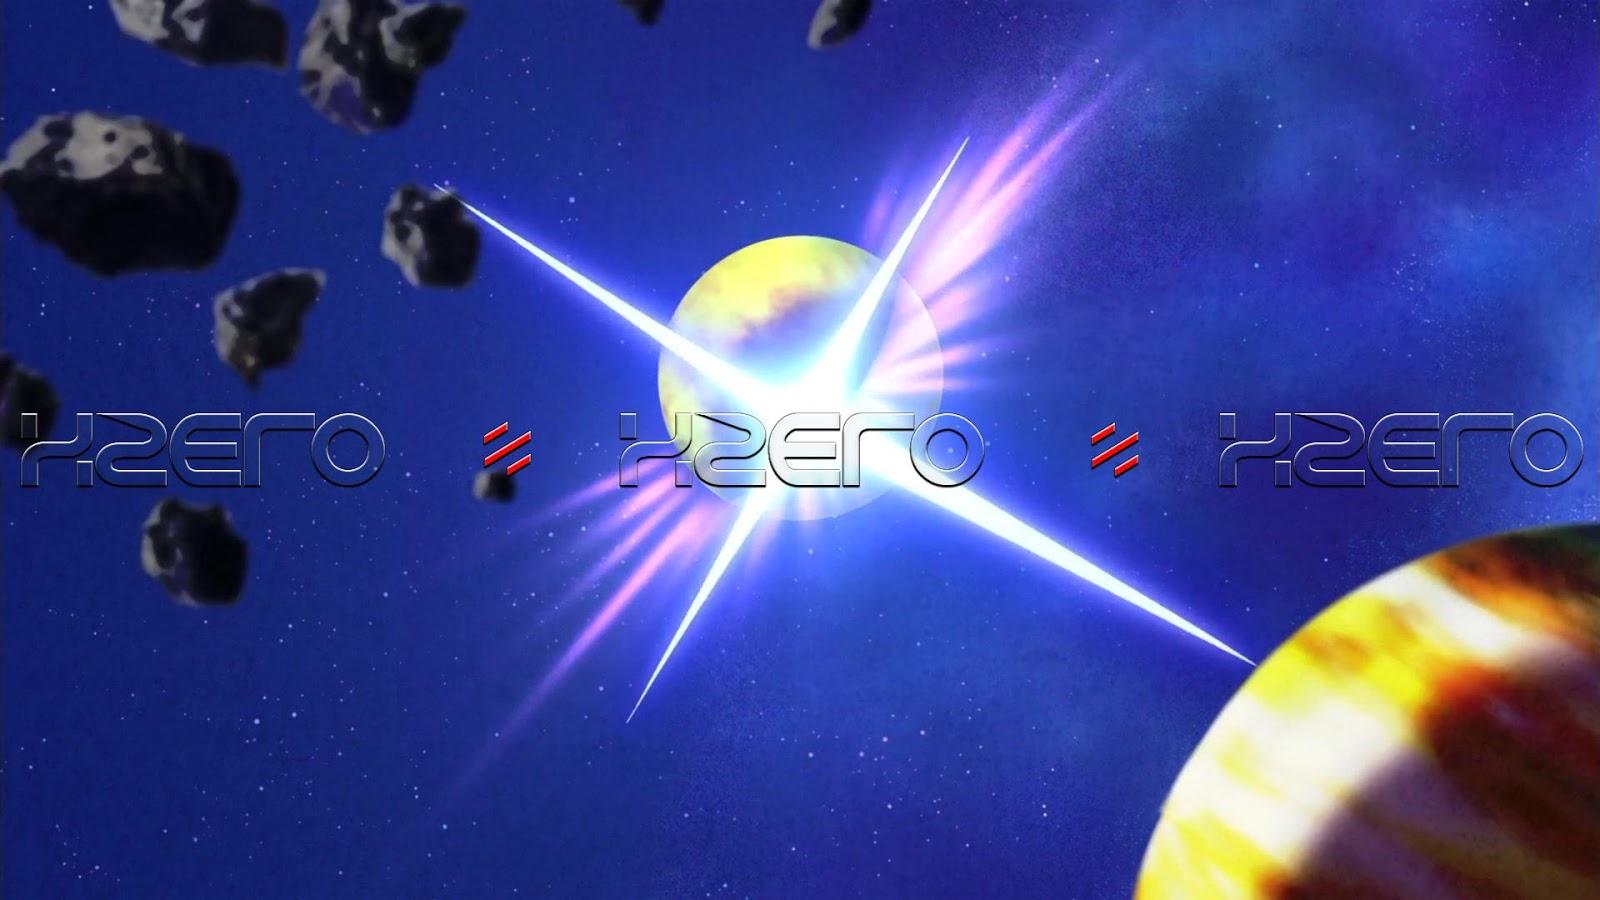 2 - Dragon Ball Super | Sub Español | BD + HD | Mega / 1fichier / Google